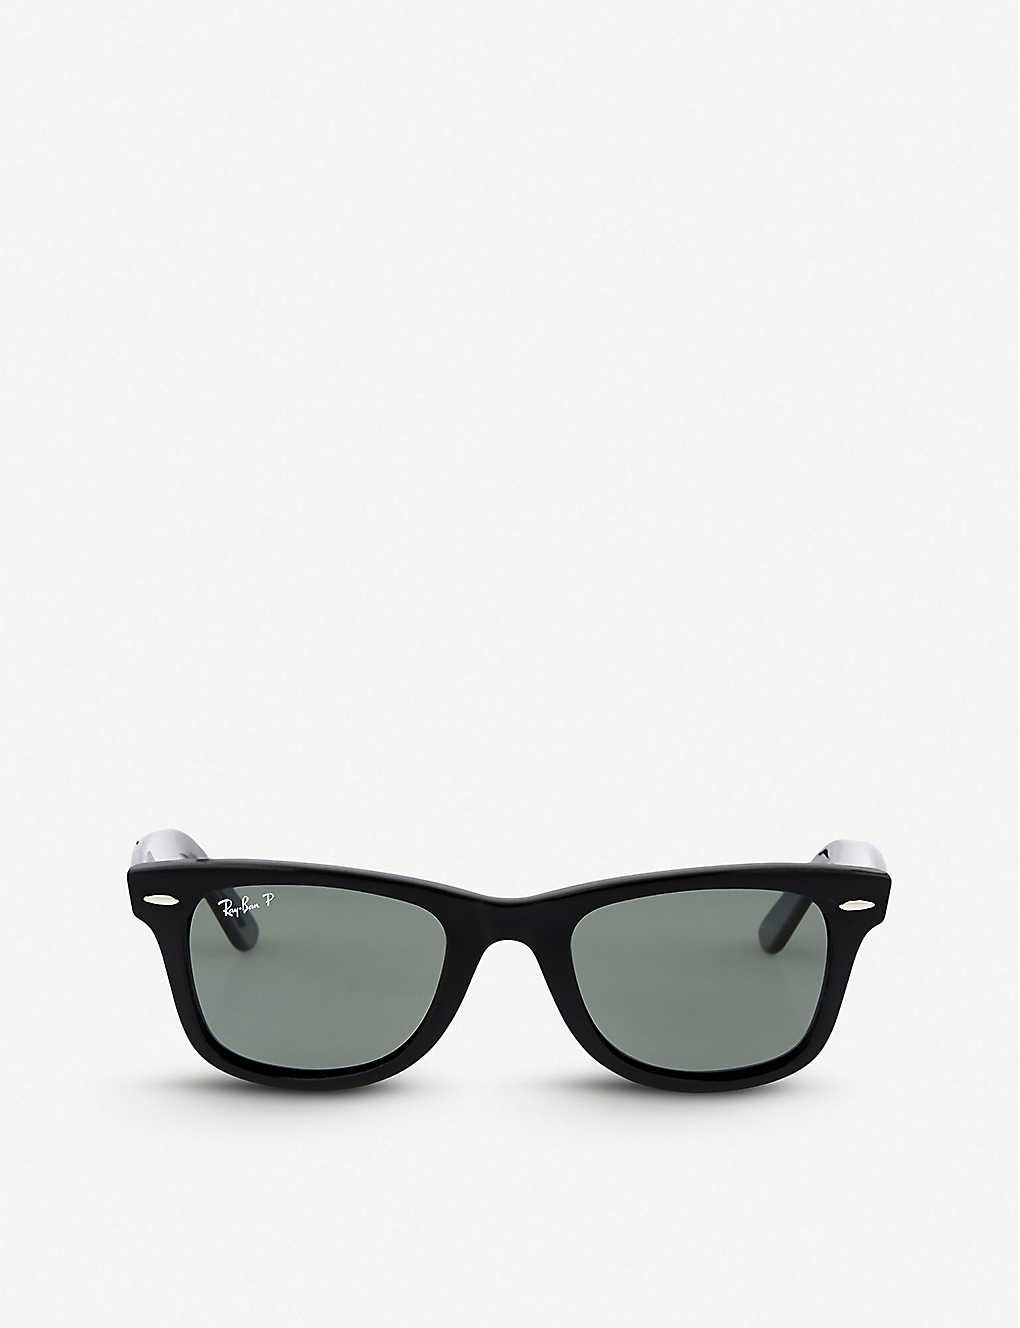 daaee2a533 RAY-BAN - Black thick frame wayfarer sunglasses RB2140